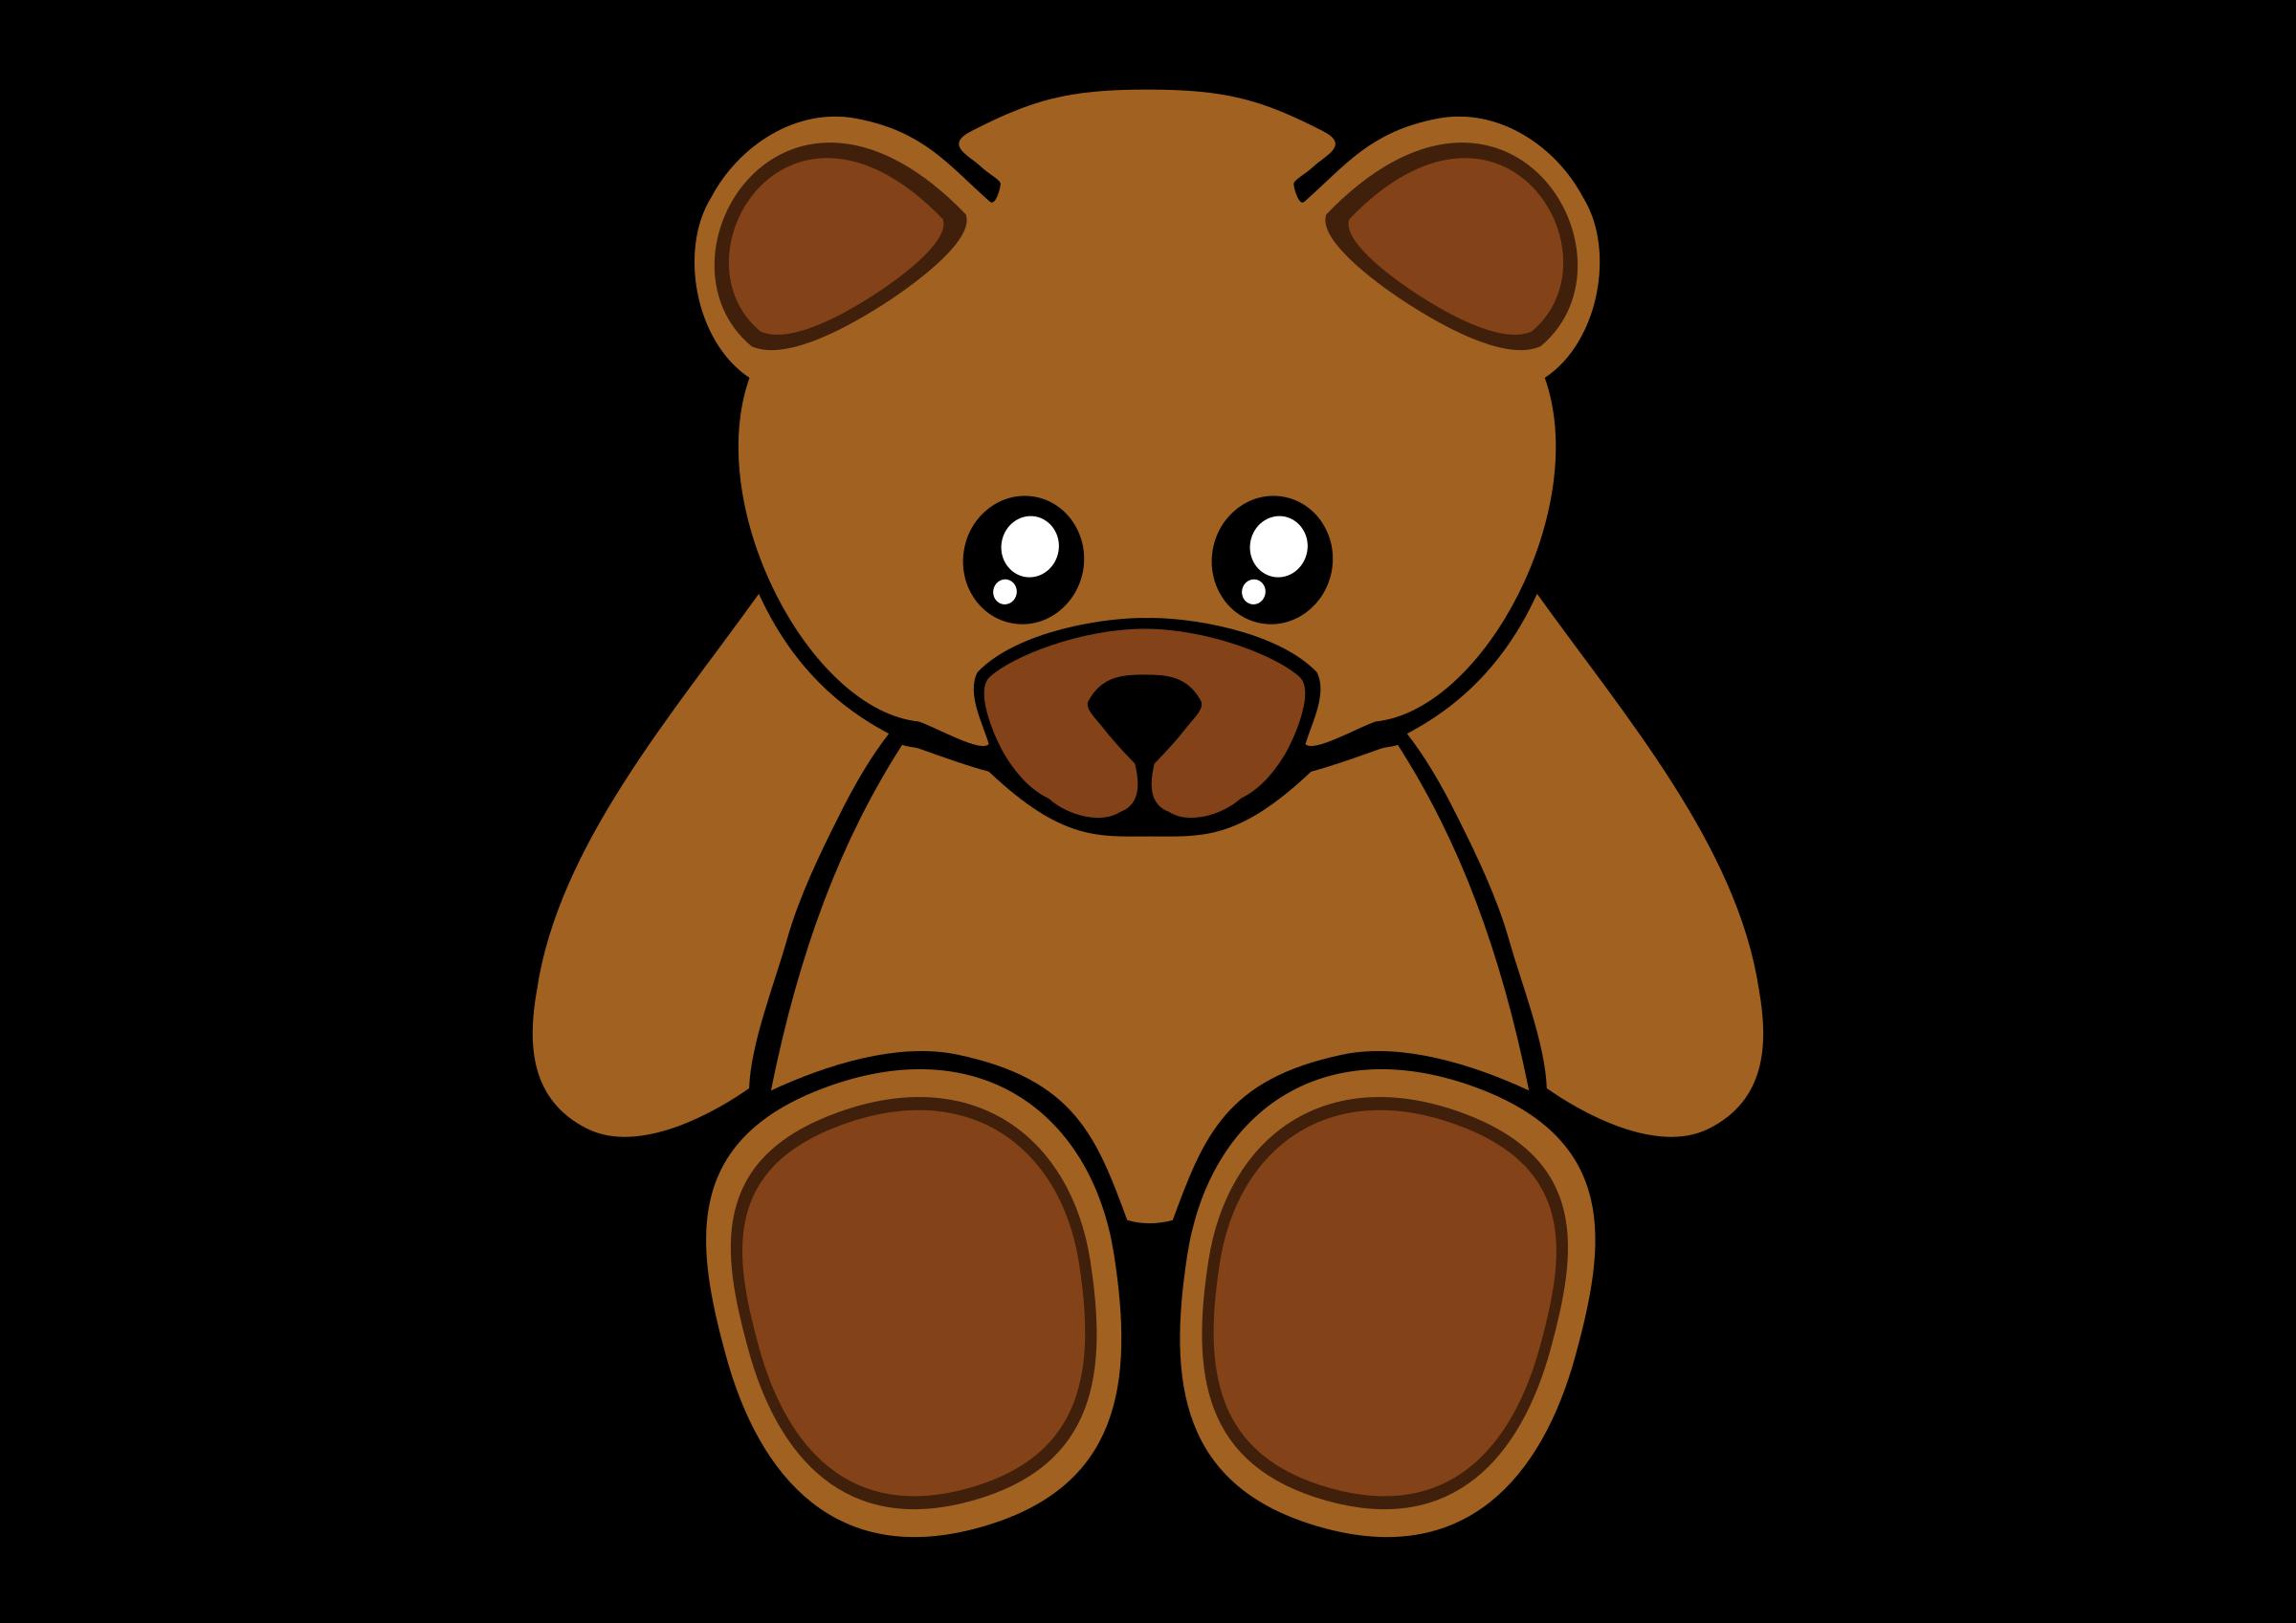 teddy bear clip art pinterest - photo #40